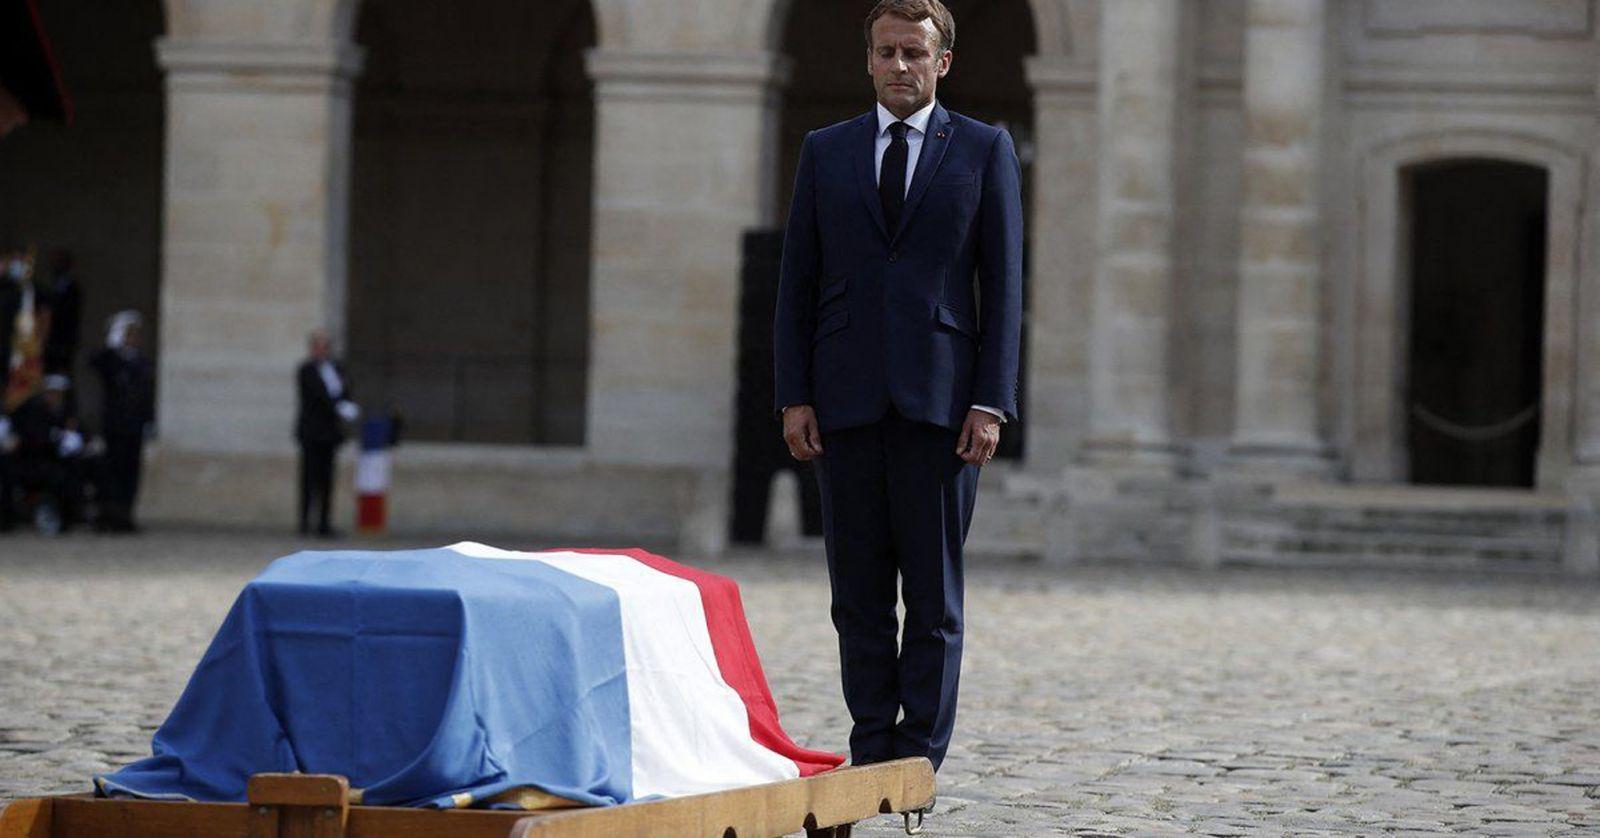 Tổng thống Emmanuel Macron chủ trì tang lễ Jean-Paul Belmondo  ẢNH: TODAY